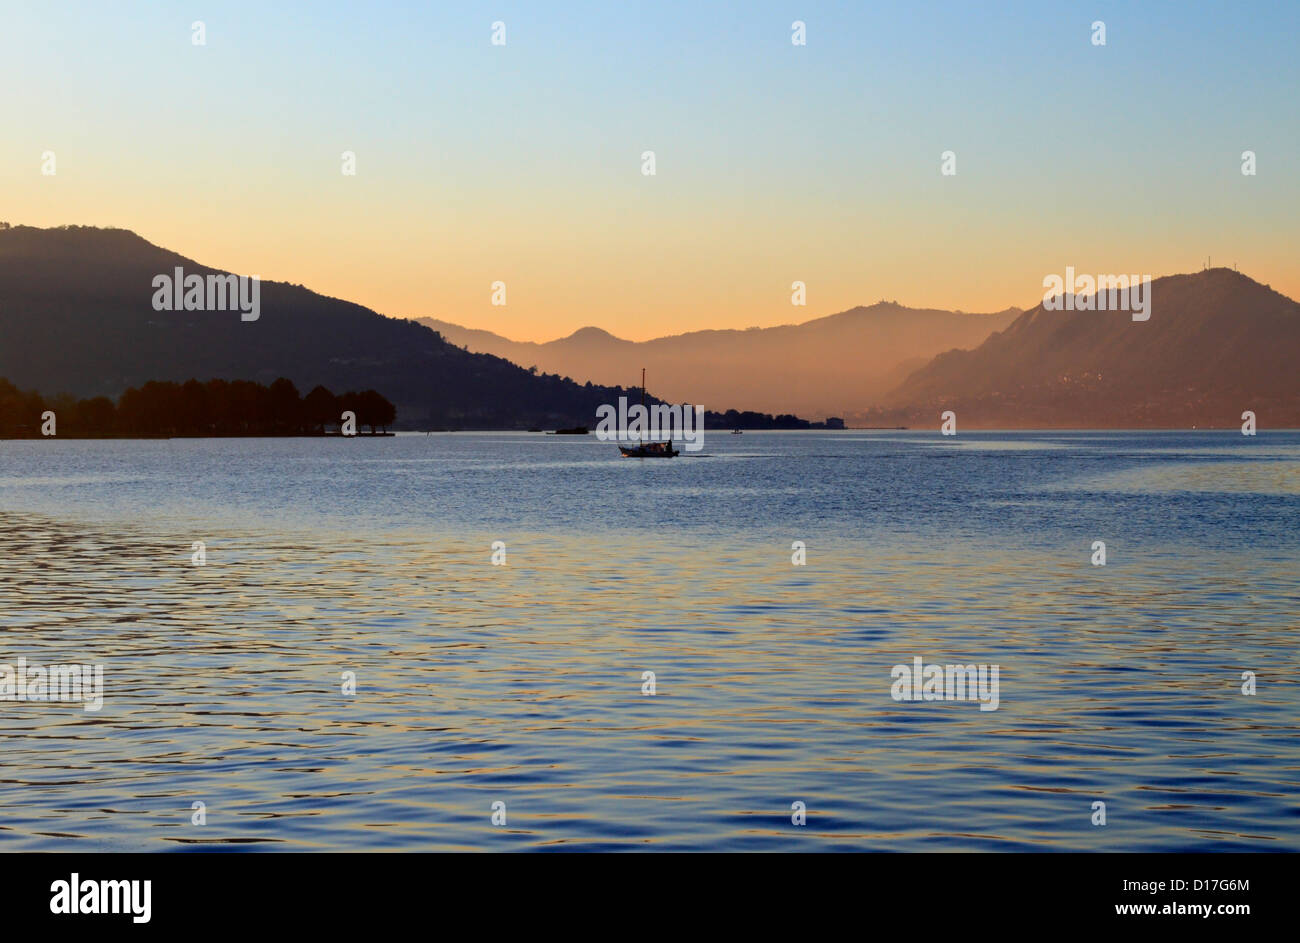 A fishing boat on Lake Iseo early evening, Iseo near Bergamo, Lombardy, Italy, Europe. - Stock Image